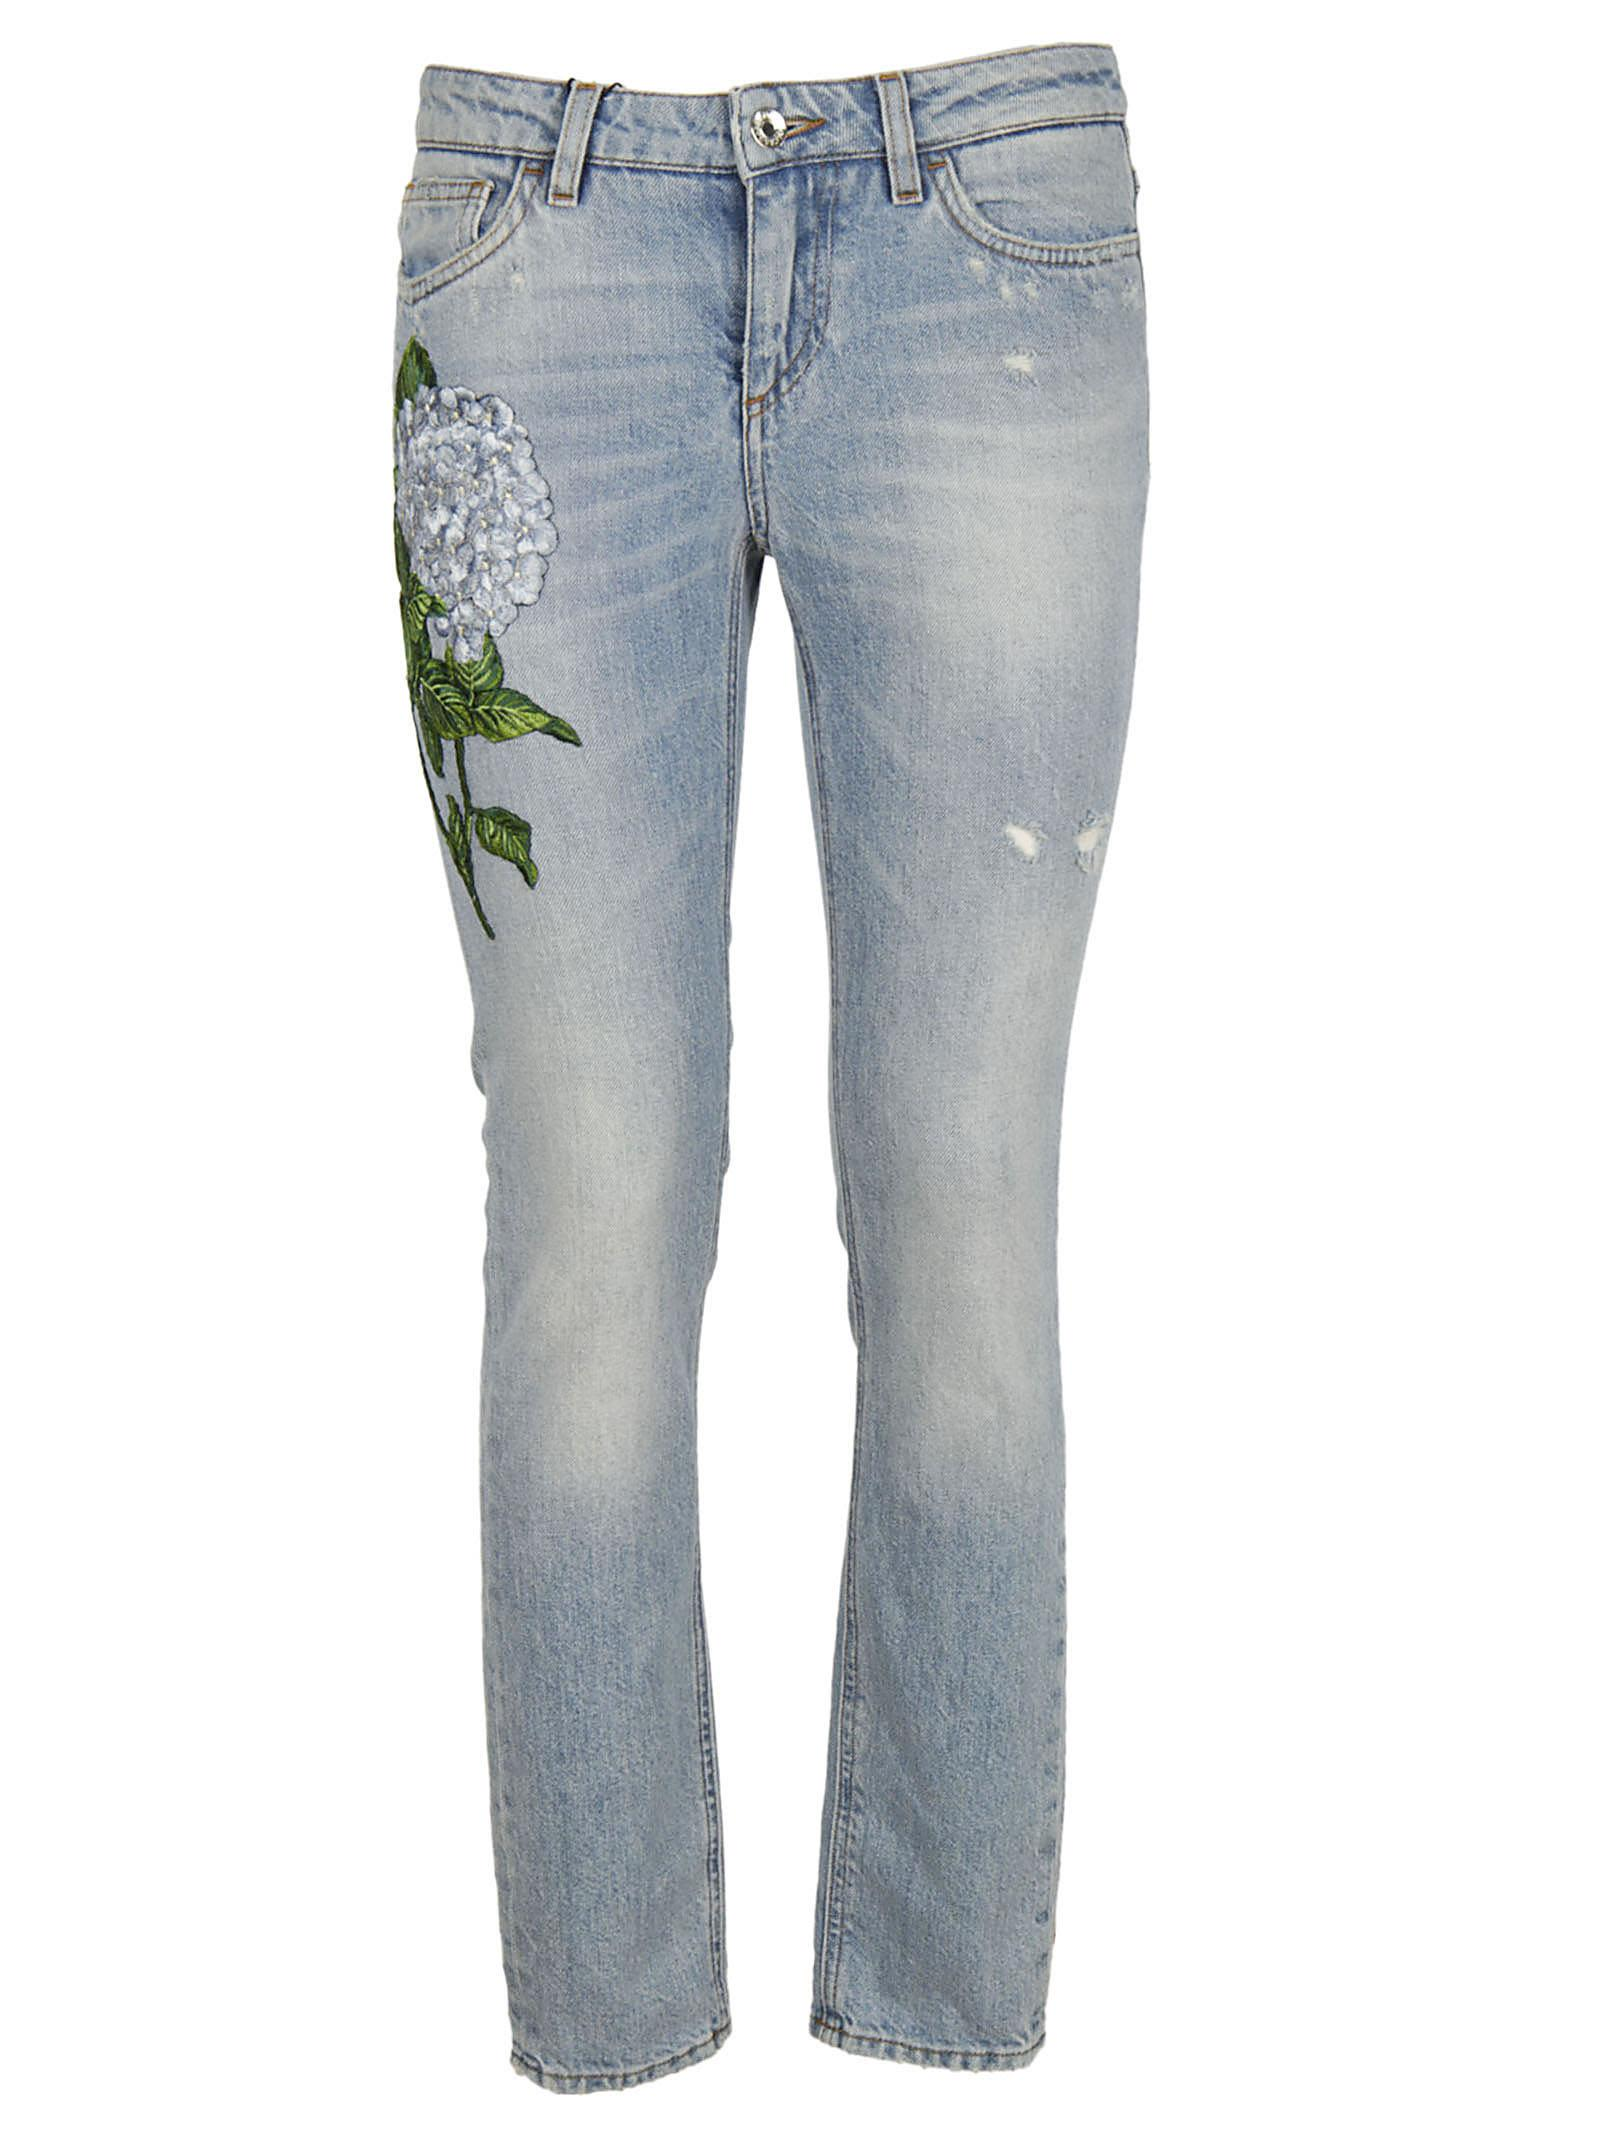 Dolce & Gabbana Floral Patch Straight-leg Jeans